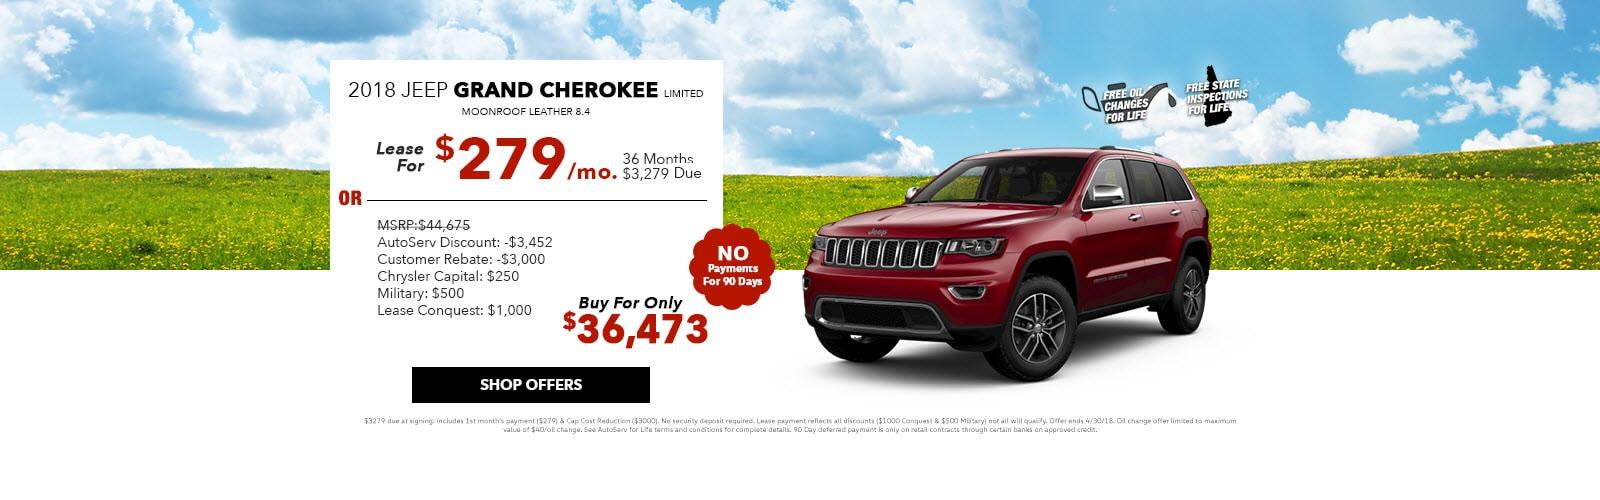 Autoserv Tilton Nh >> AutoServ Chrysler of Tilton | Jeep Dealers in NH